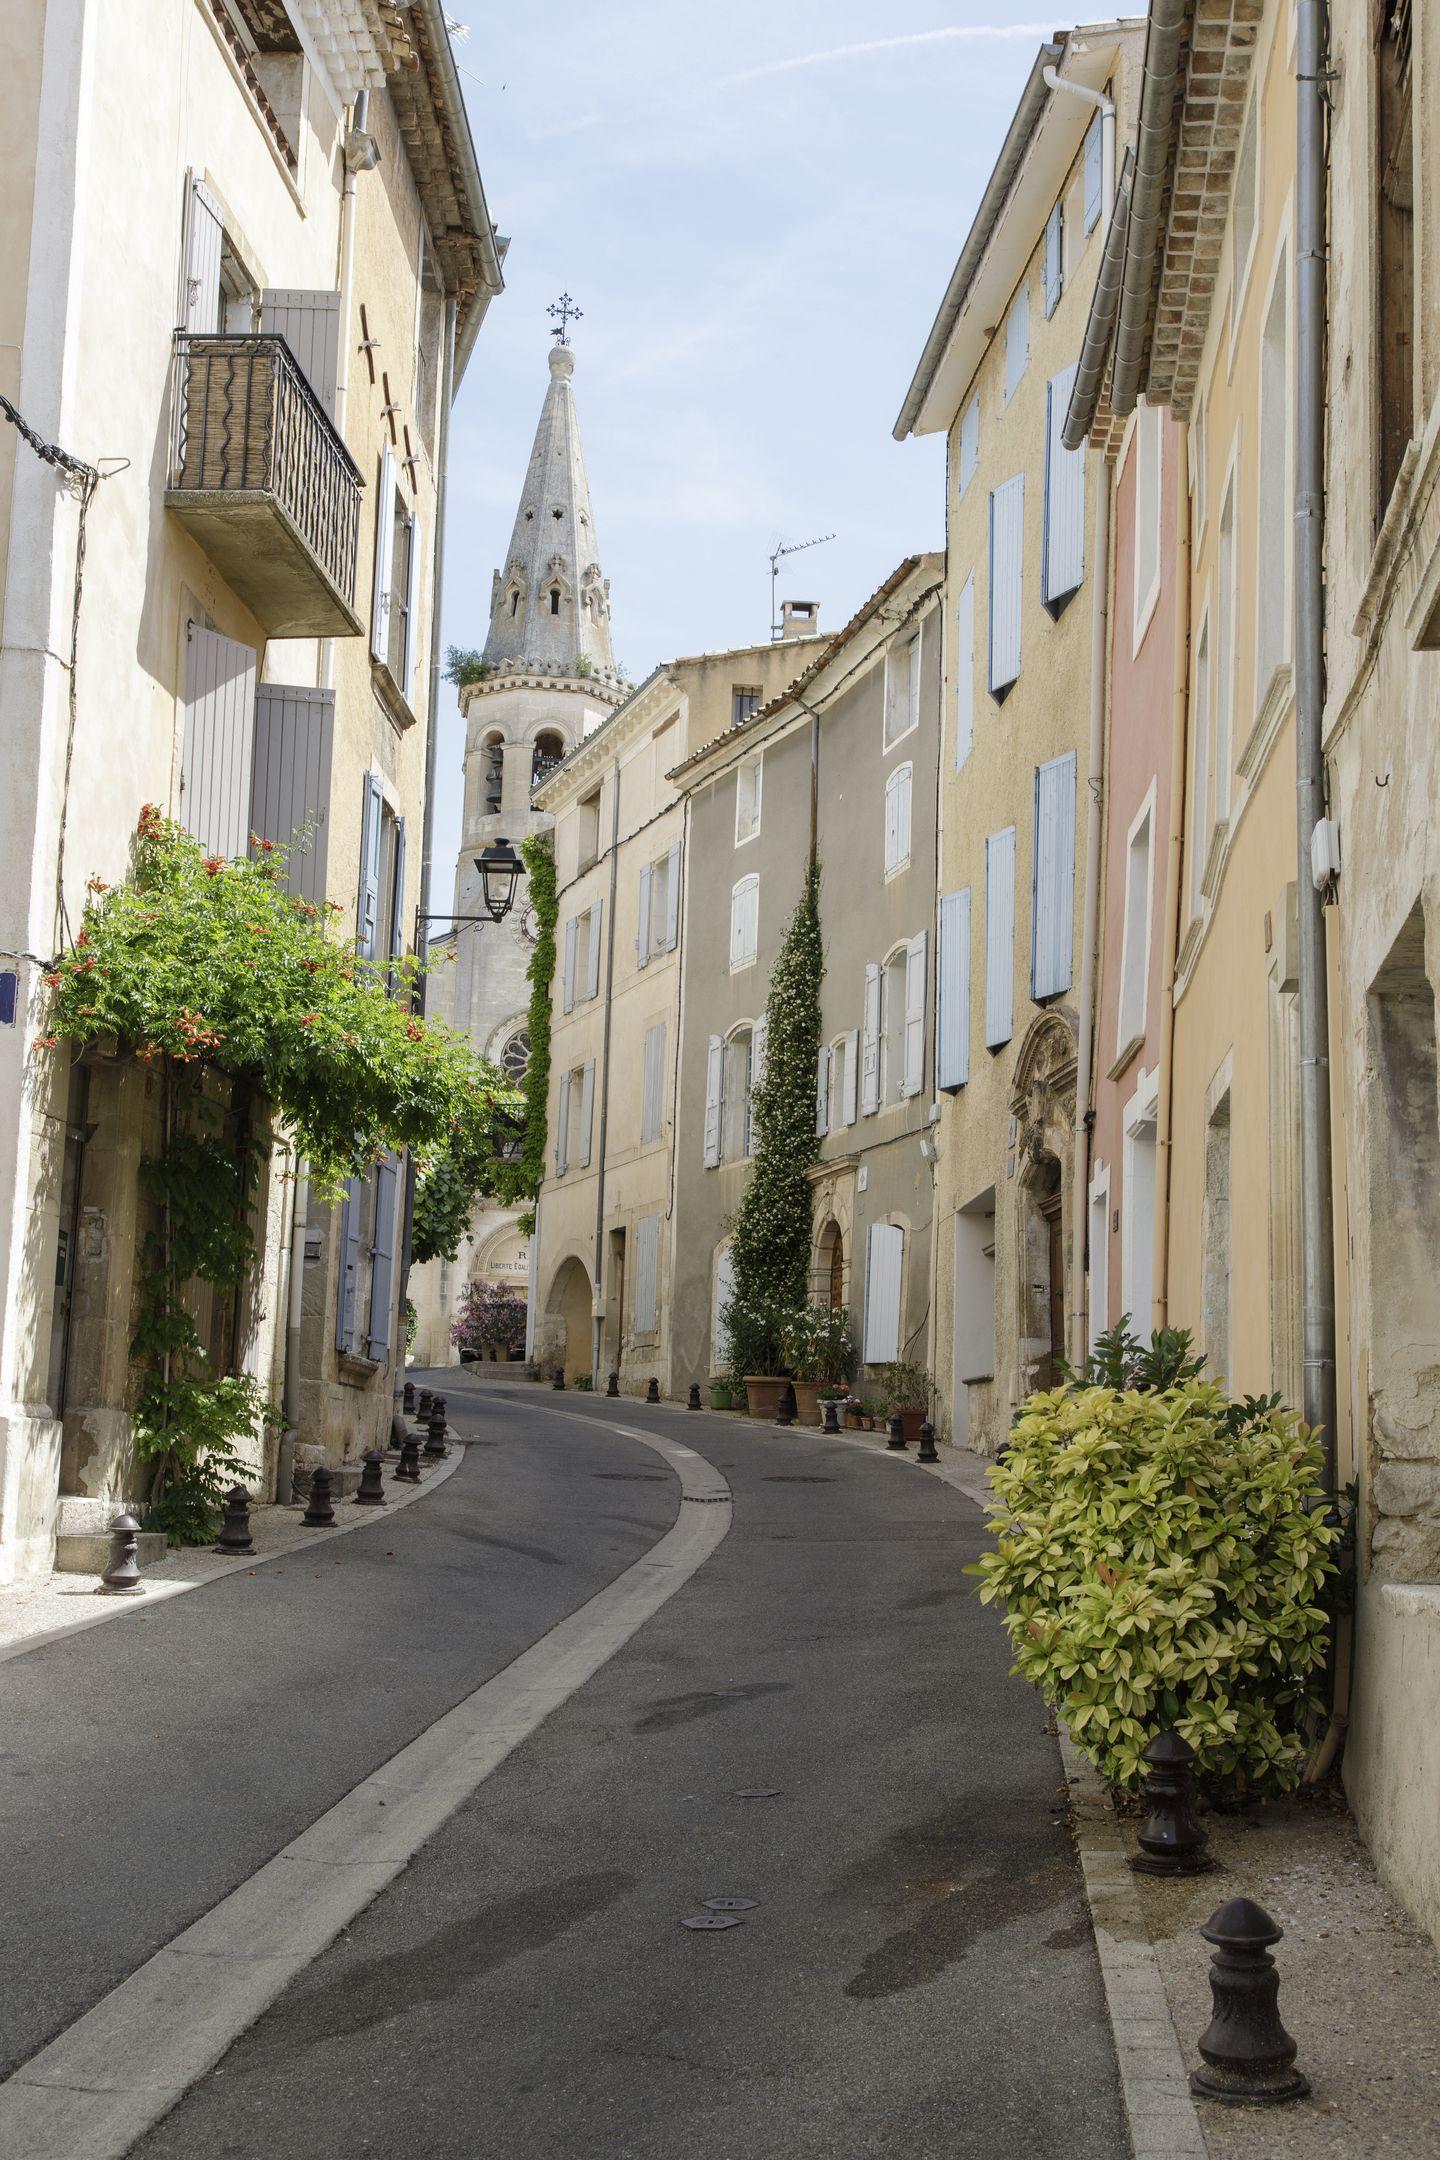 20210627-Provence-11-27-31-019